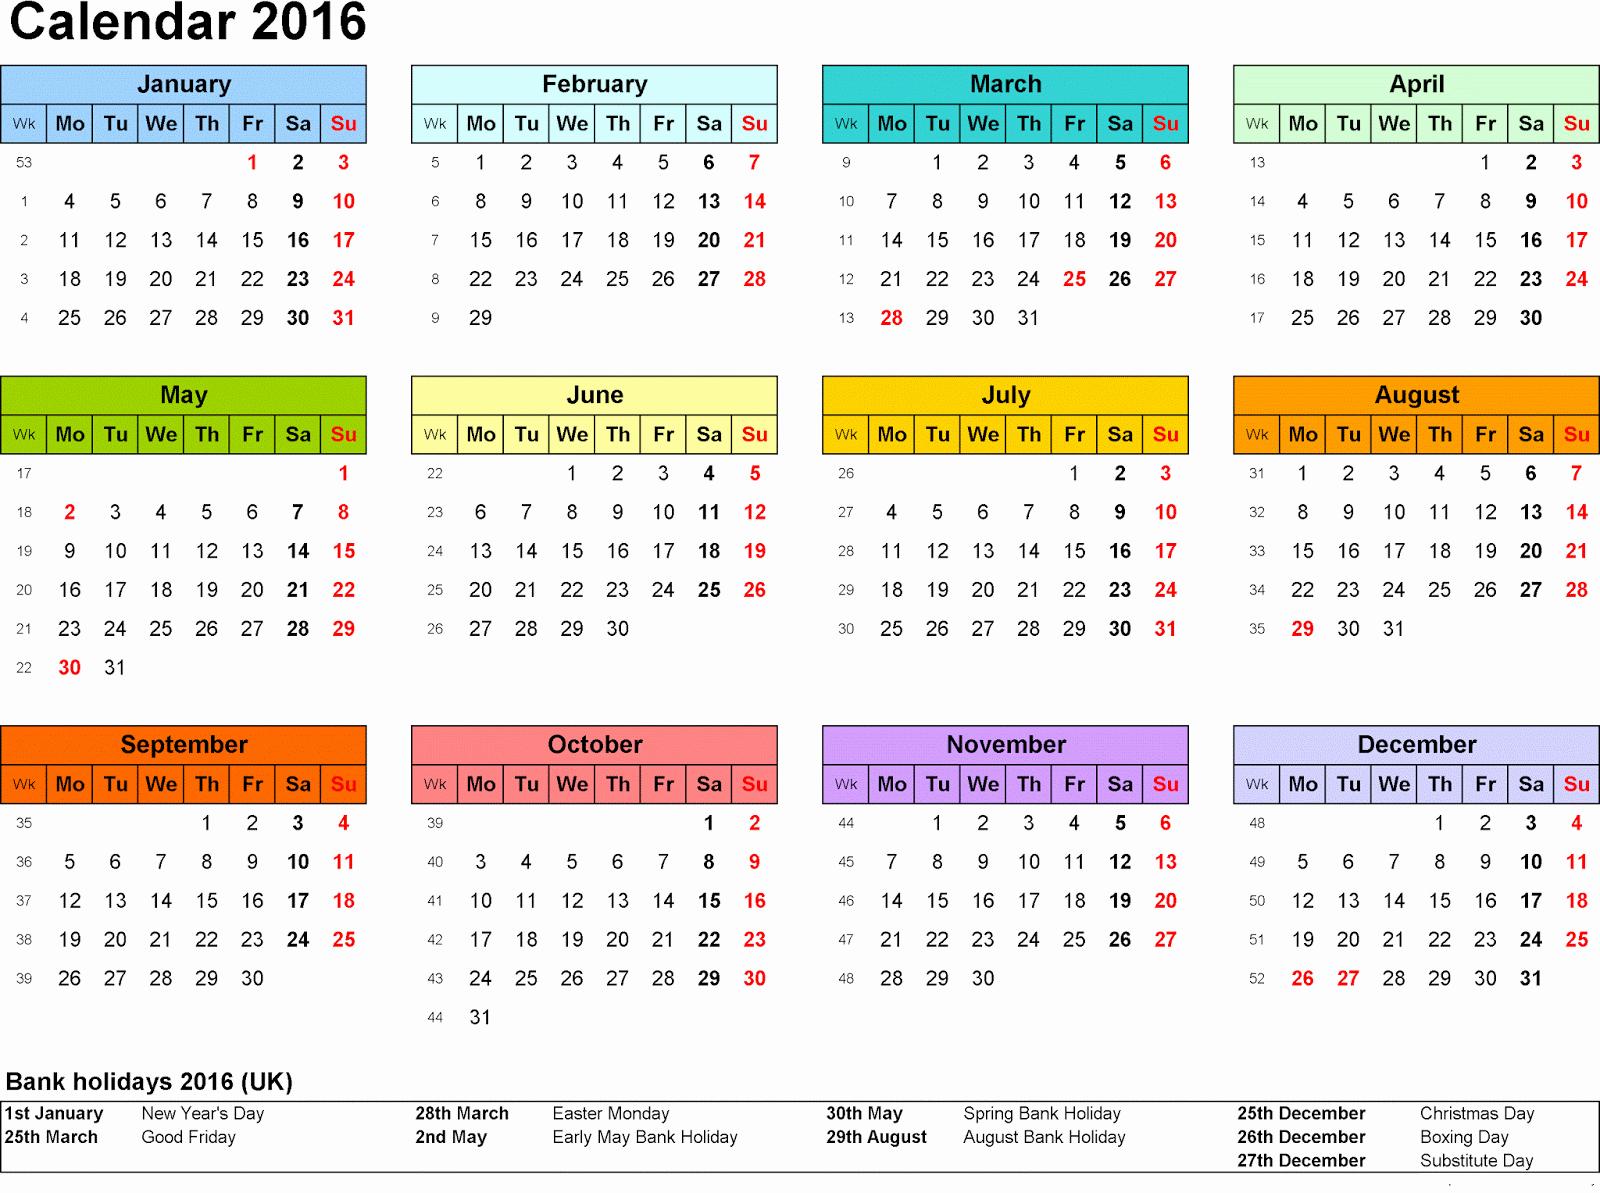 Free Printable Calendars 2016 Templates Luxury [free] Printable Calendar Templates 2016